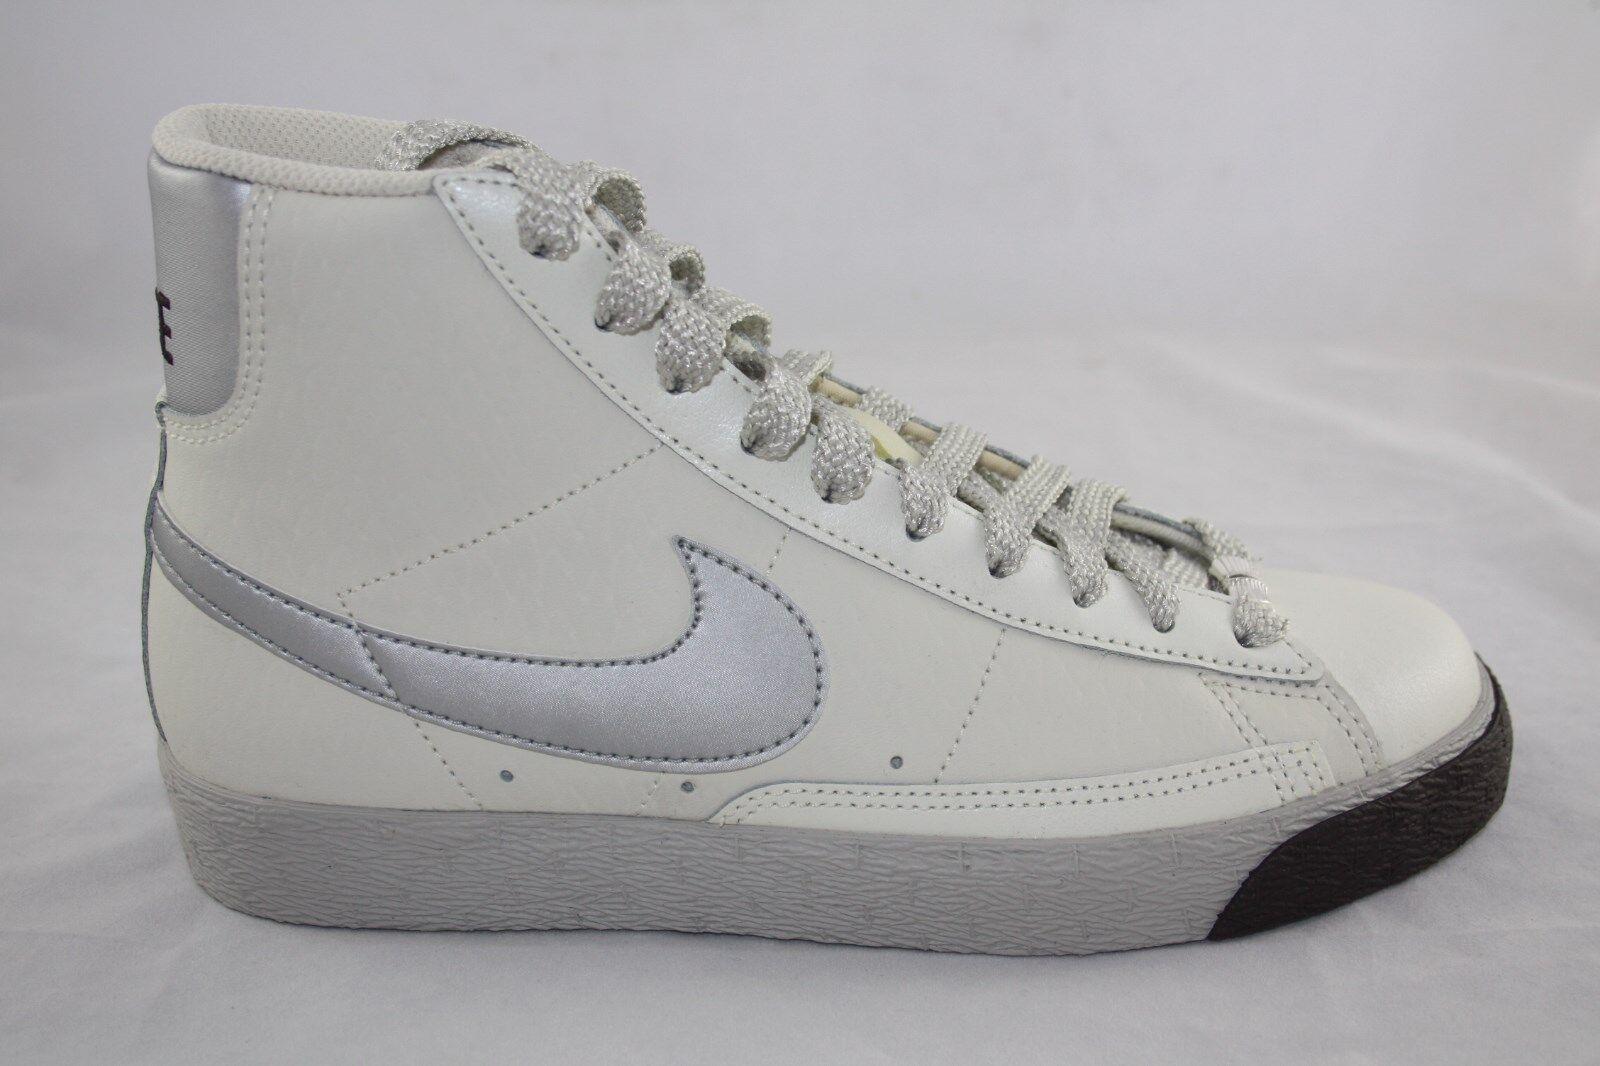 newest 5e64e 92463 wmns shoe nike blazer high 317808-001 soft perl matalic silver silver  silver grey